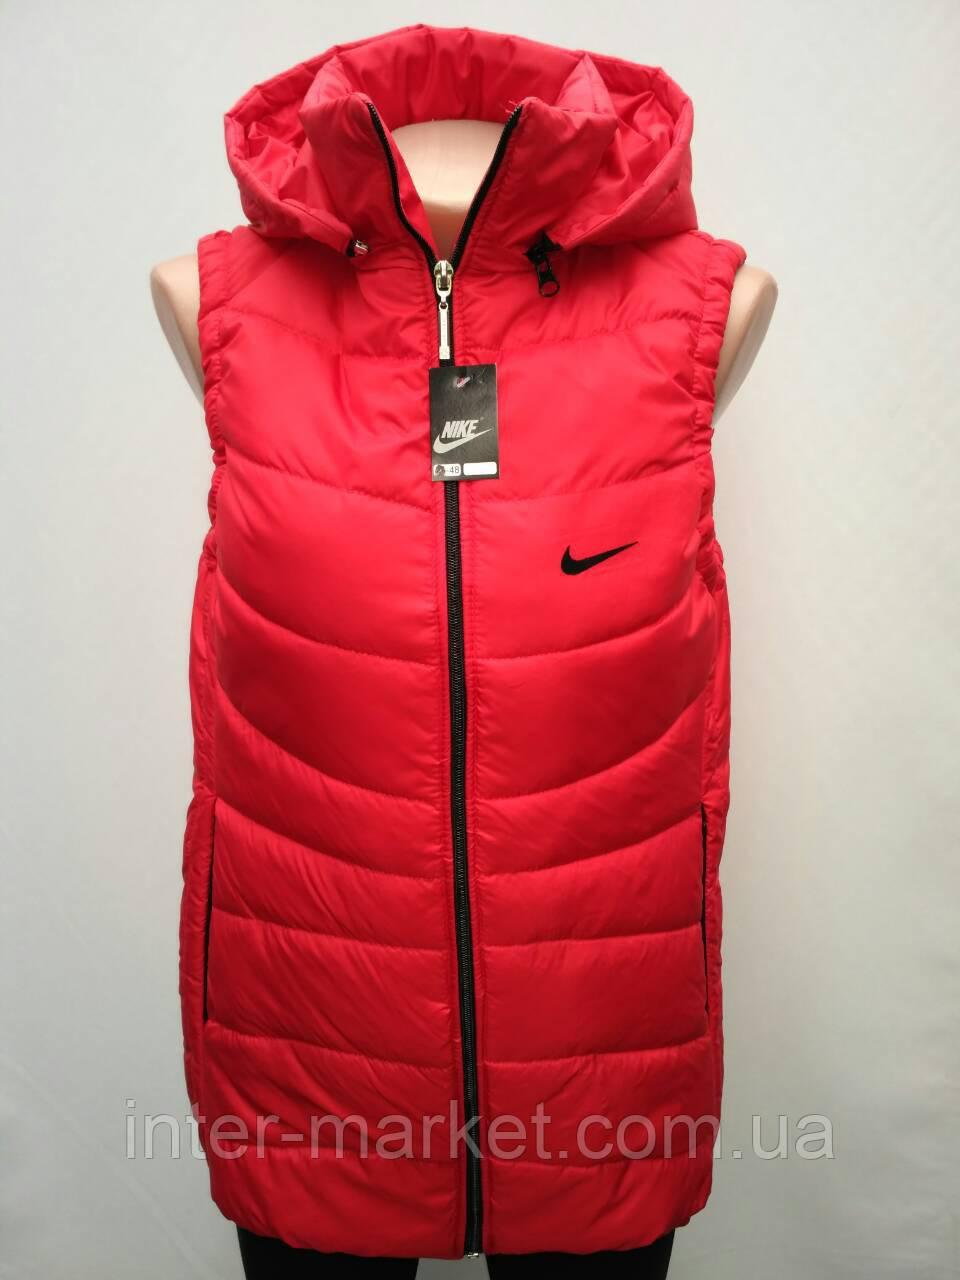 244eafb7b61d09 Женская Спортивная Жилетка в Стиле Nike на Замке Красная — в ...